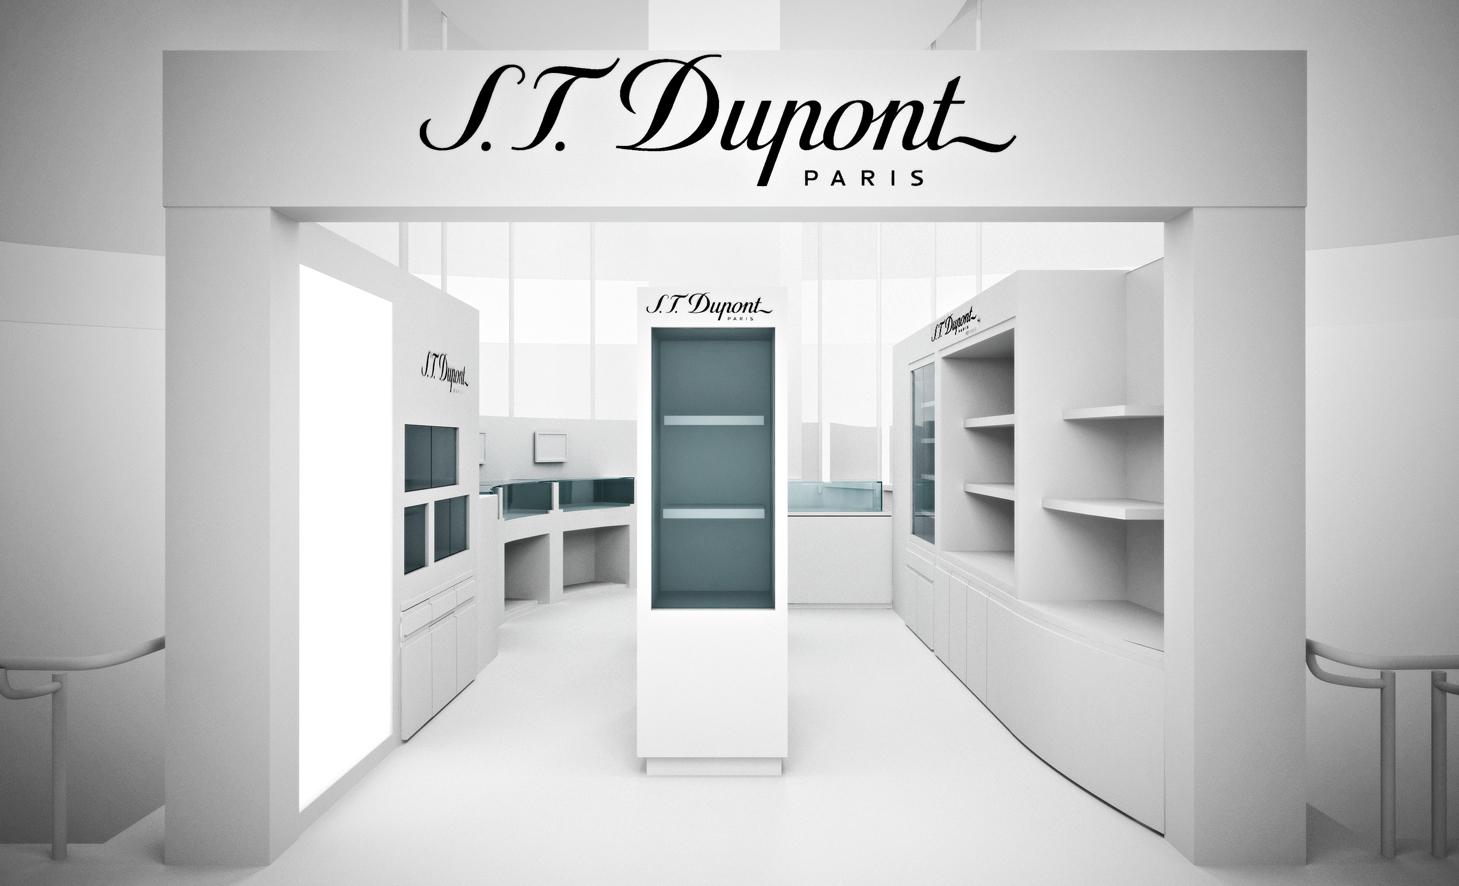 architecture-design S.T. Dupont